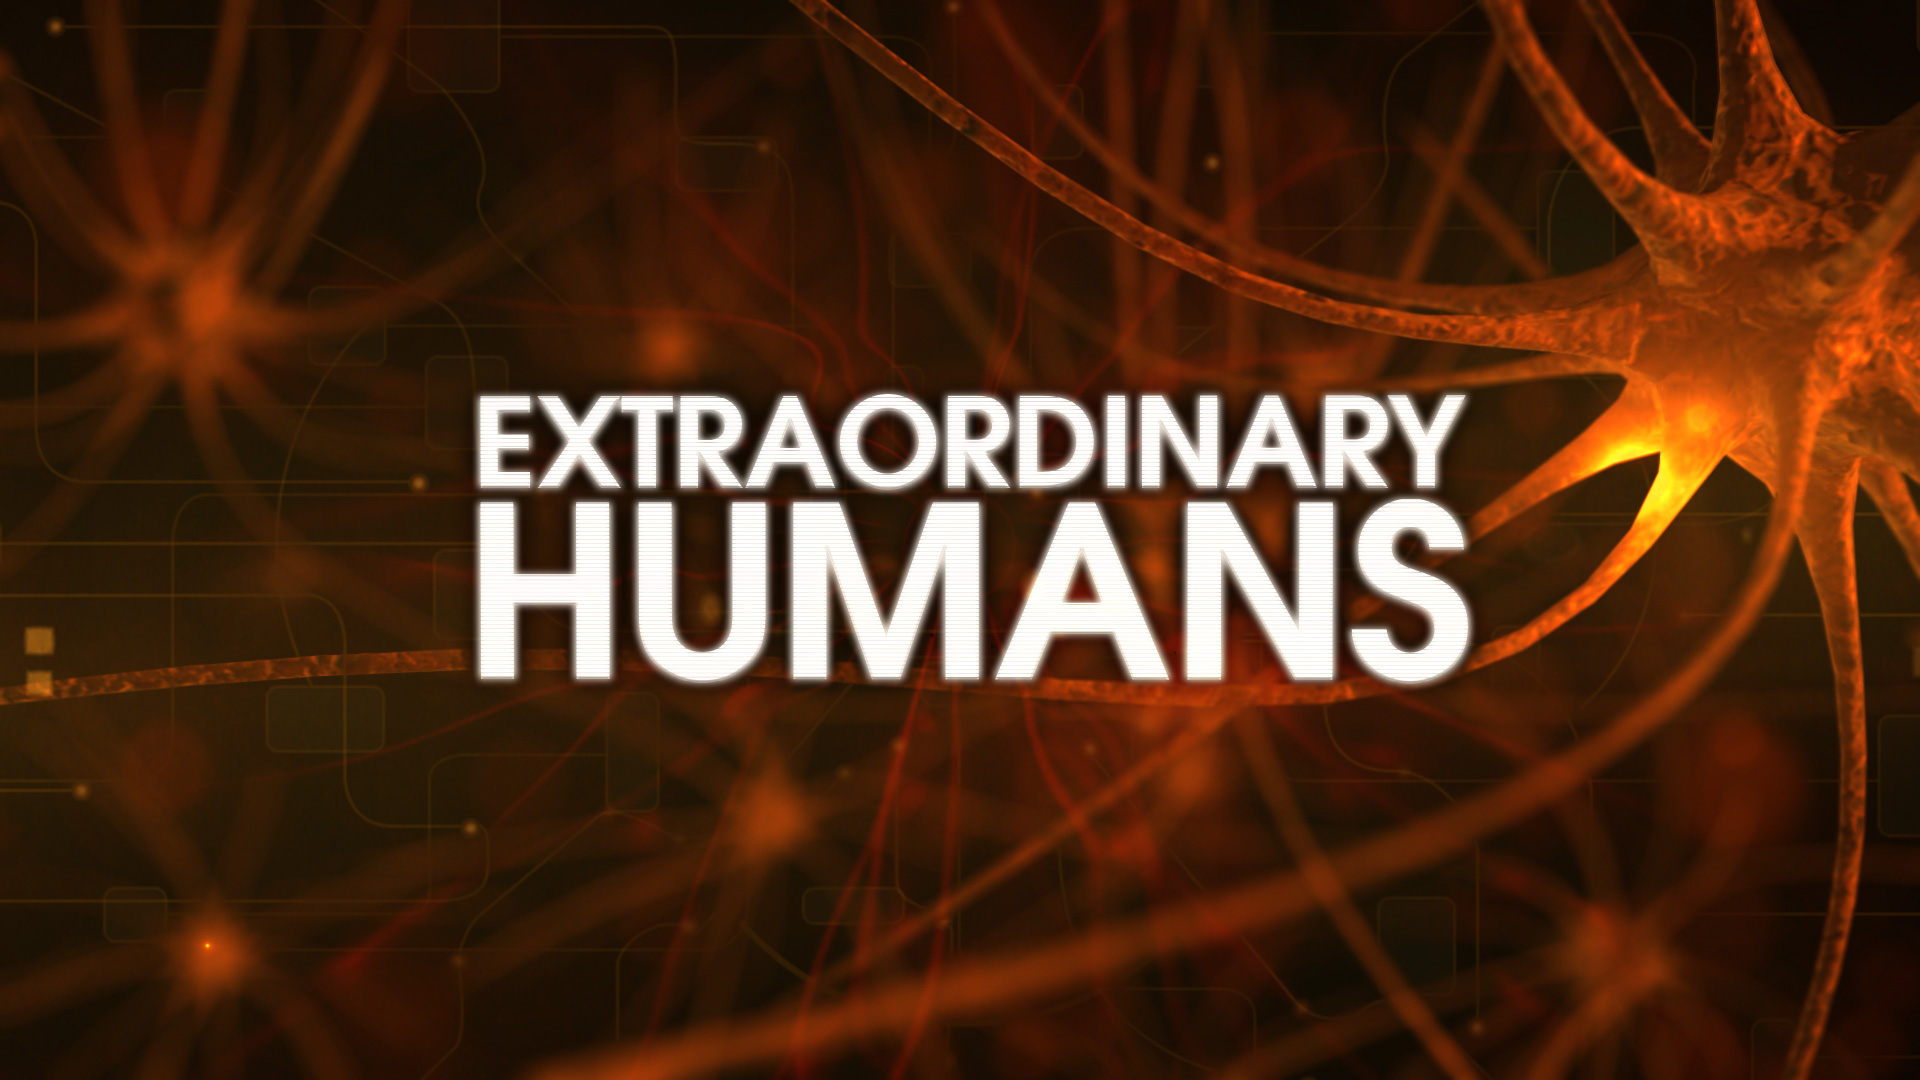 Extraordinary Humans ©Holey & Moley Ltd 2015